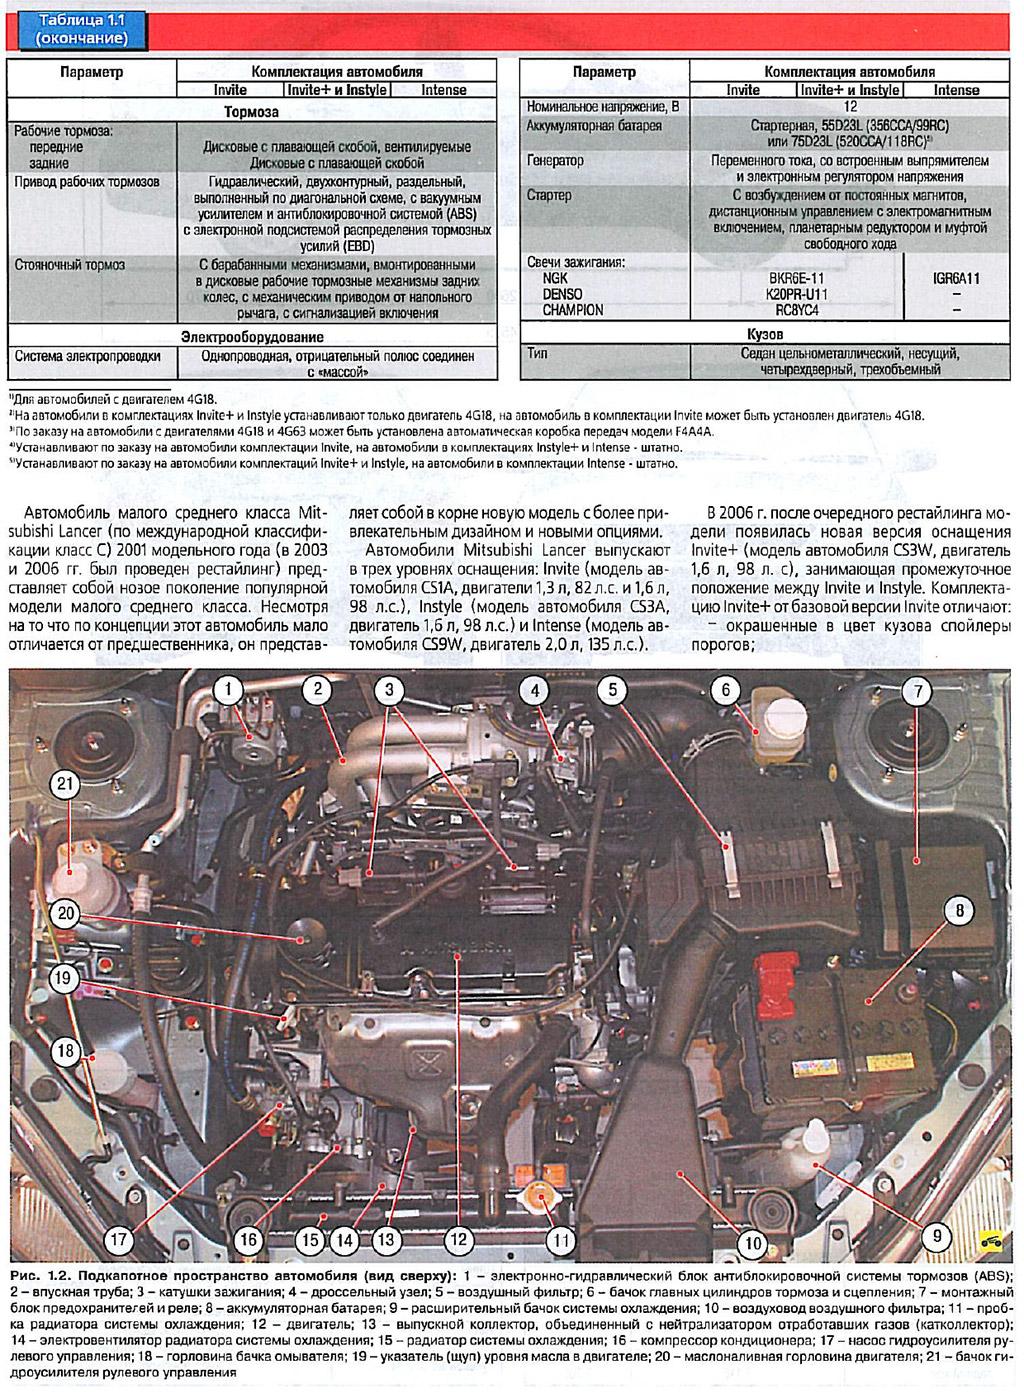 Lancer 9 схема электропроводки